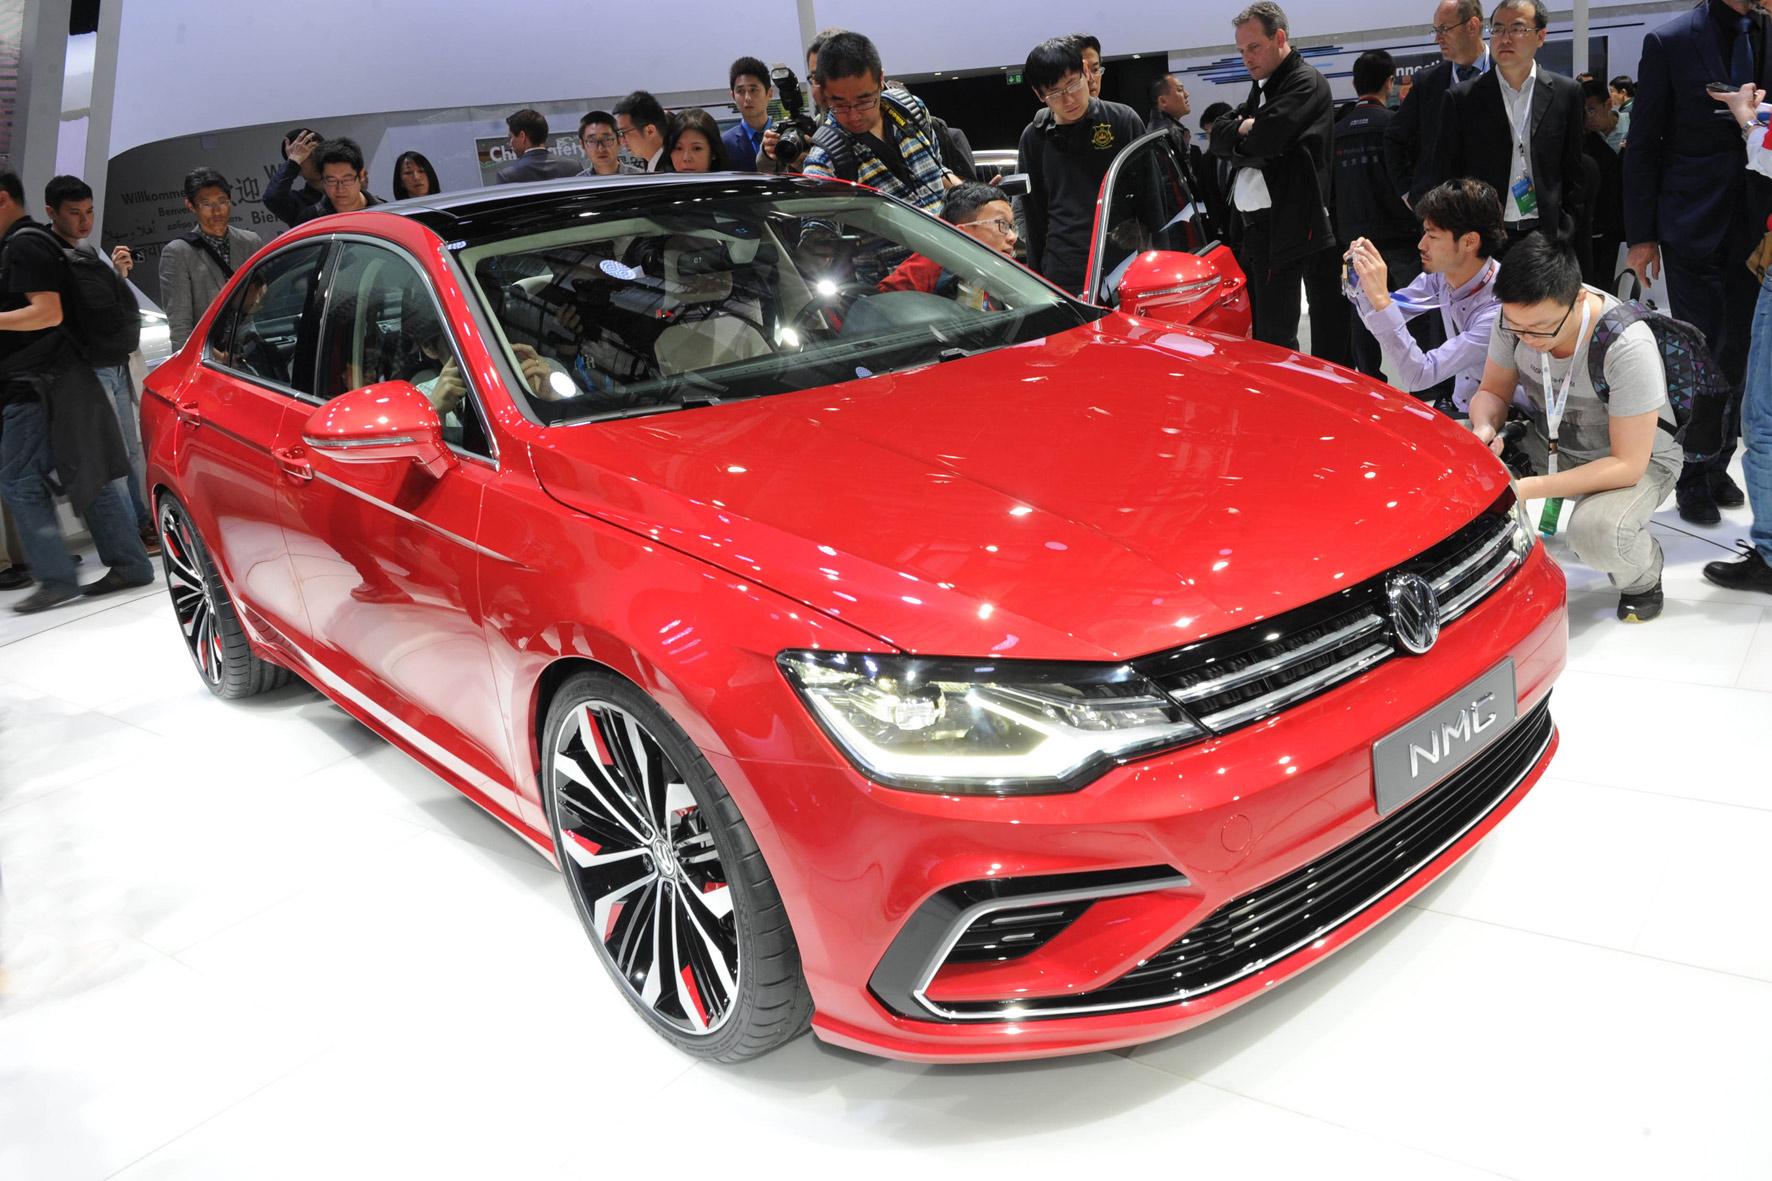 volkswagen-midsize-coupe-concept-4